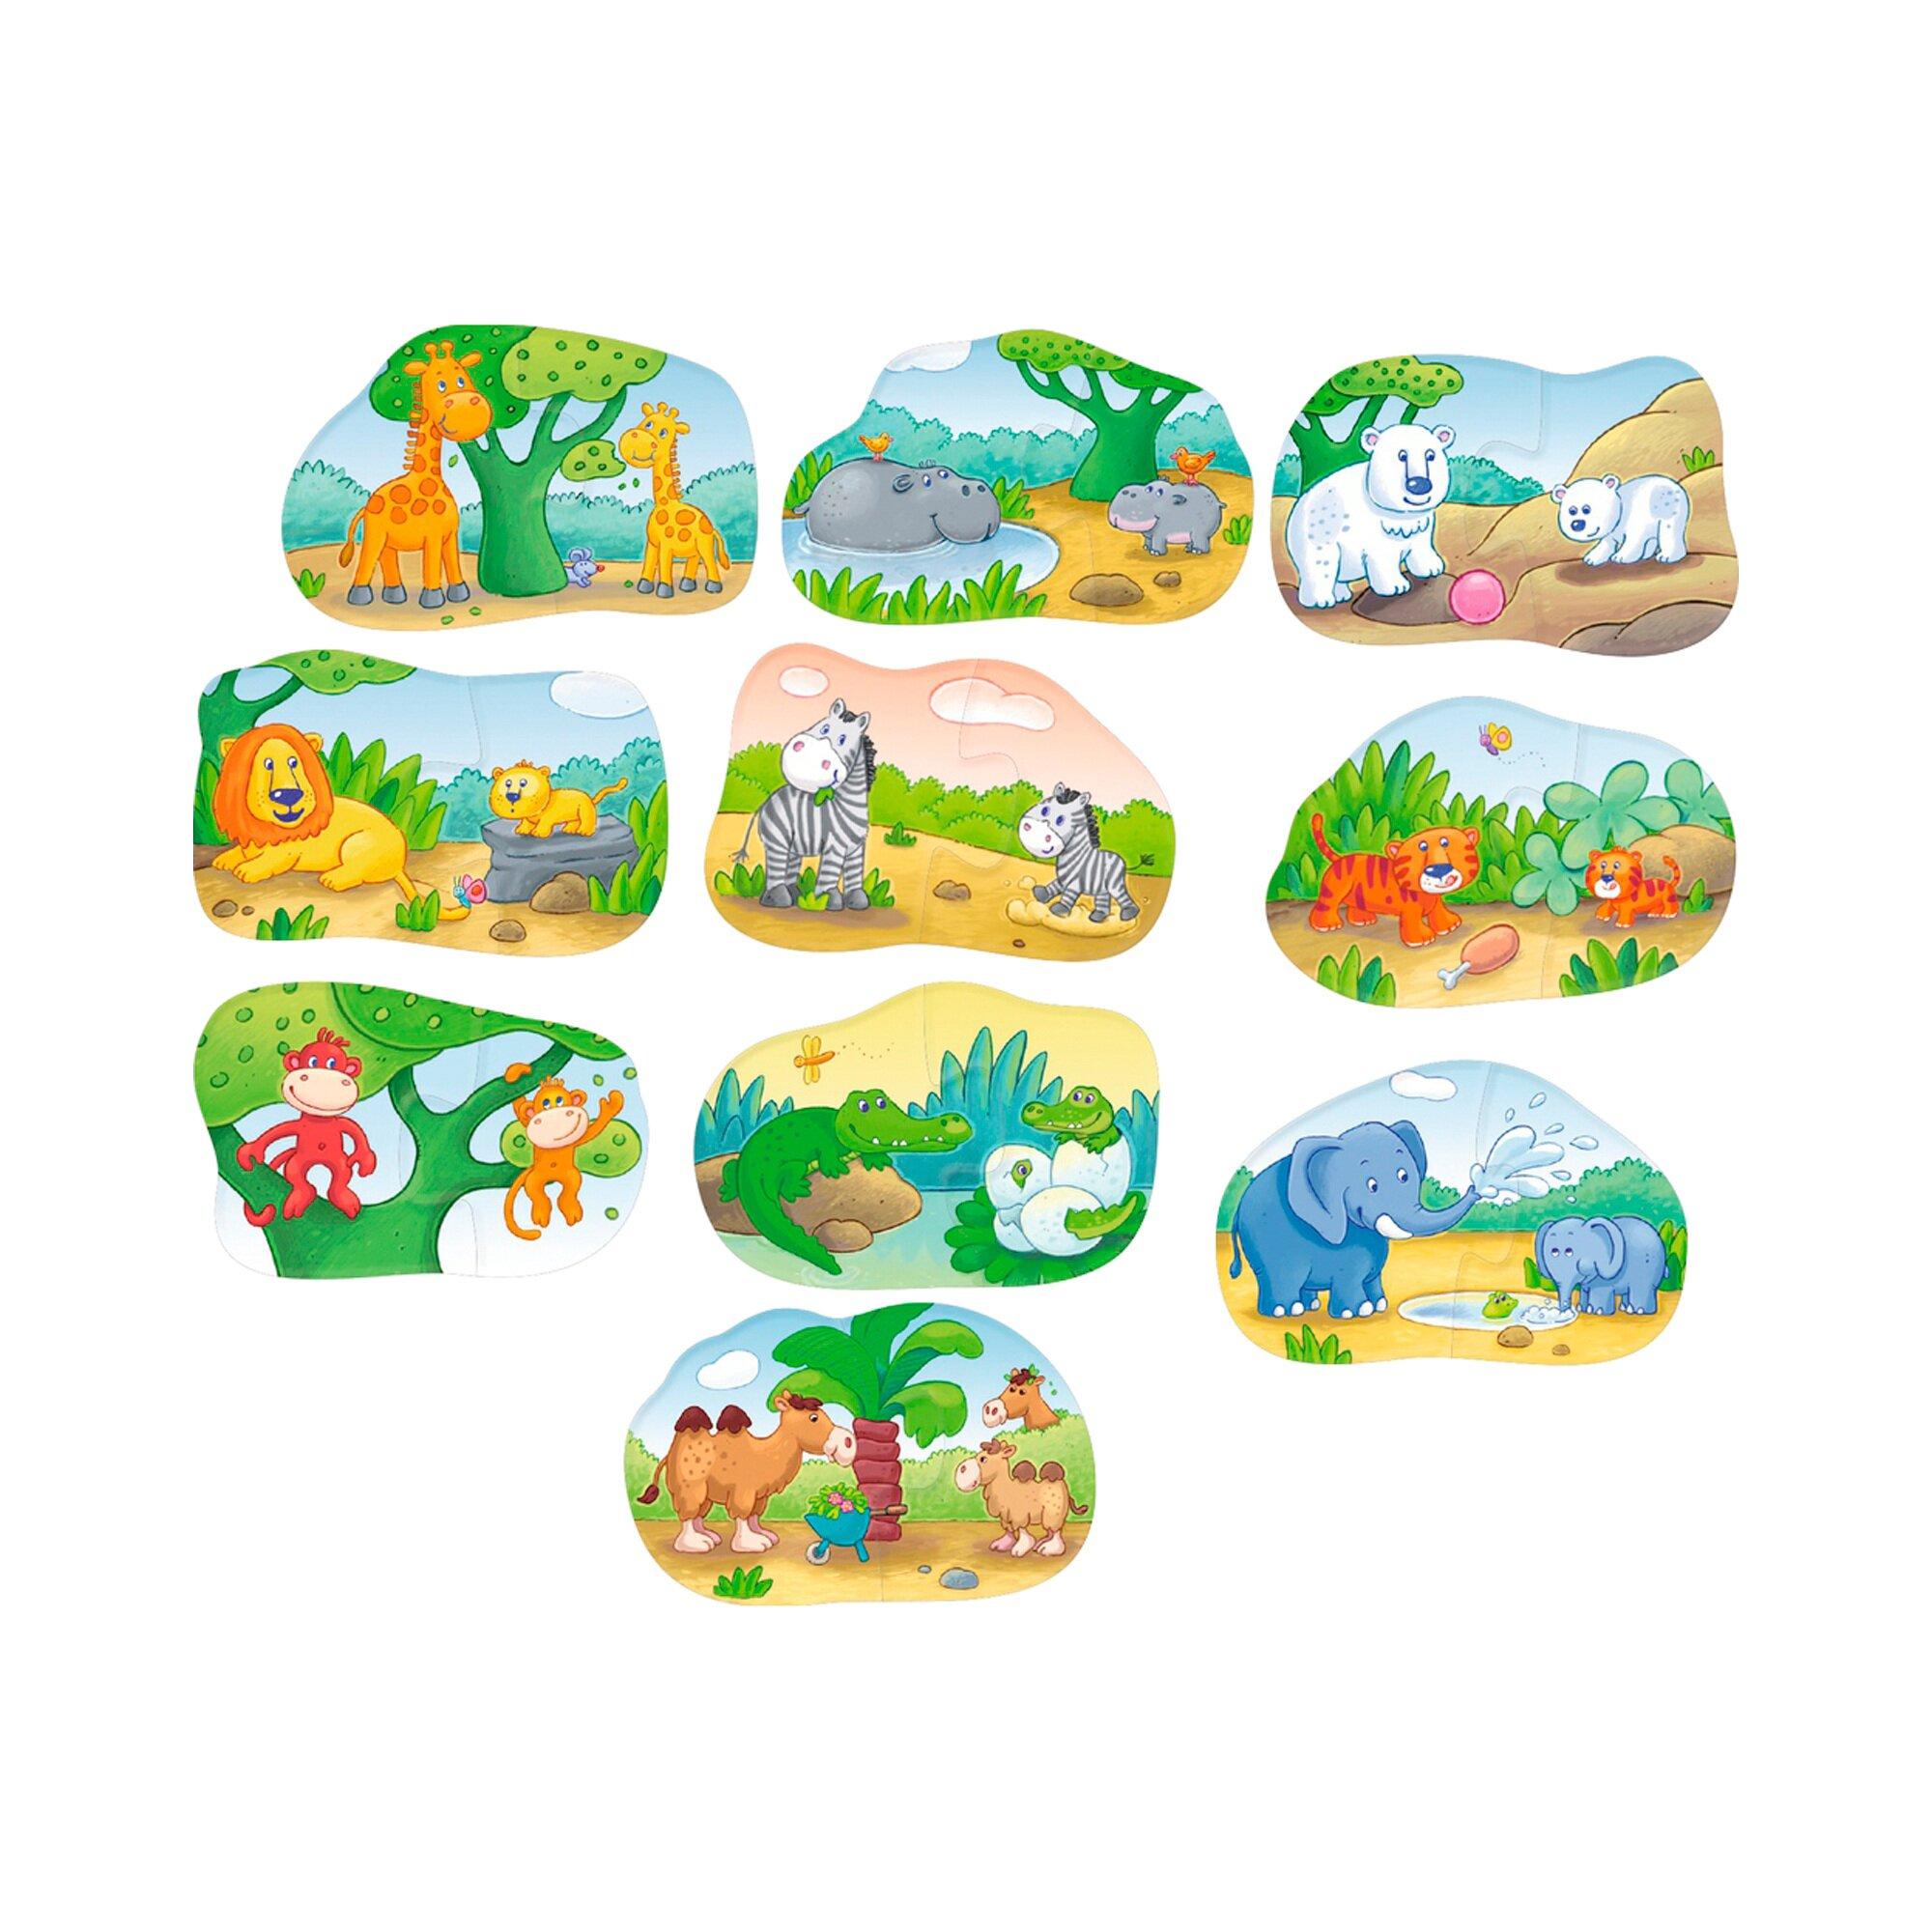 haba-1-2-puzzelei-tierkinder, 7.99 EUR @ babywalz-de